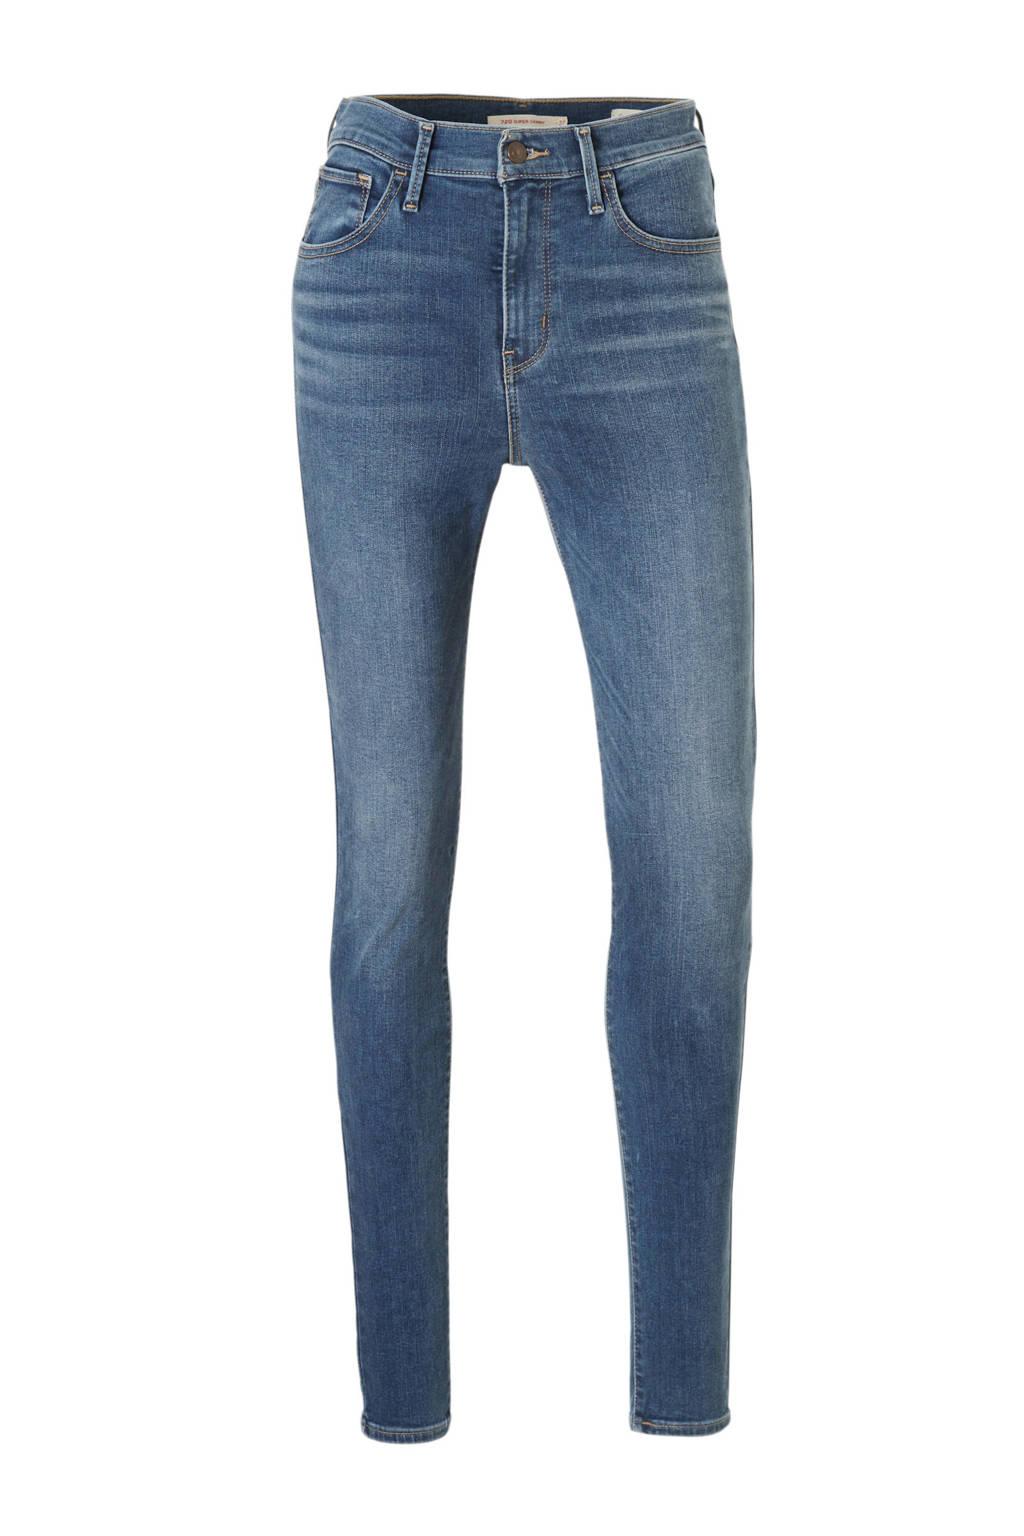 Levi's high waist skinny jeans ivy midblue